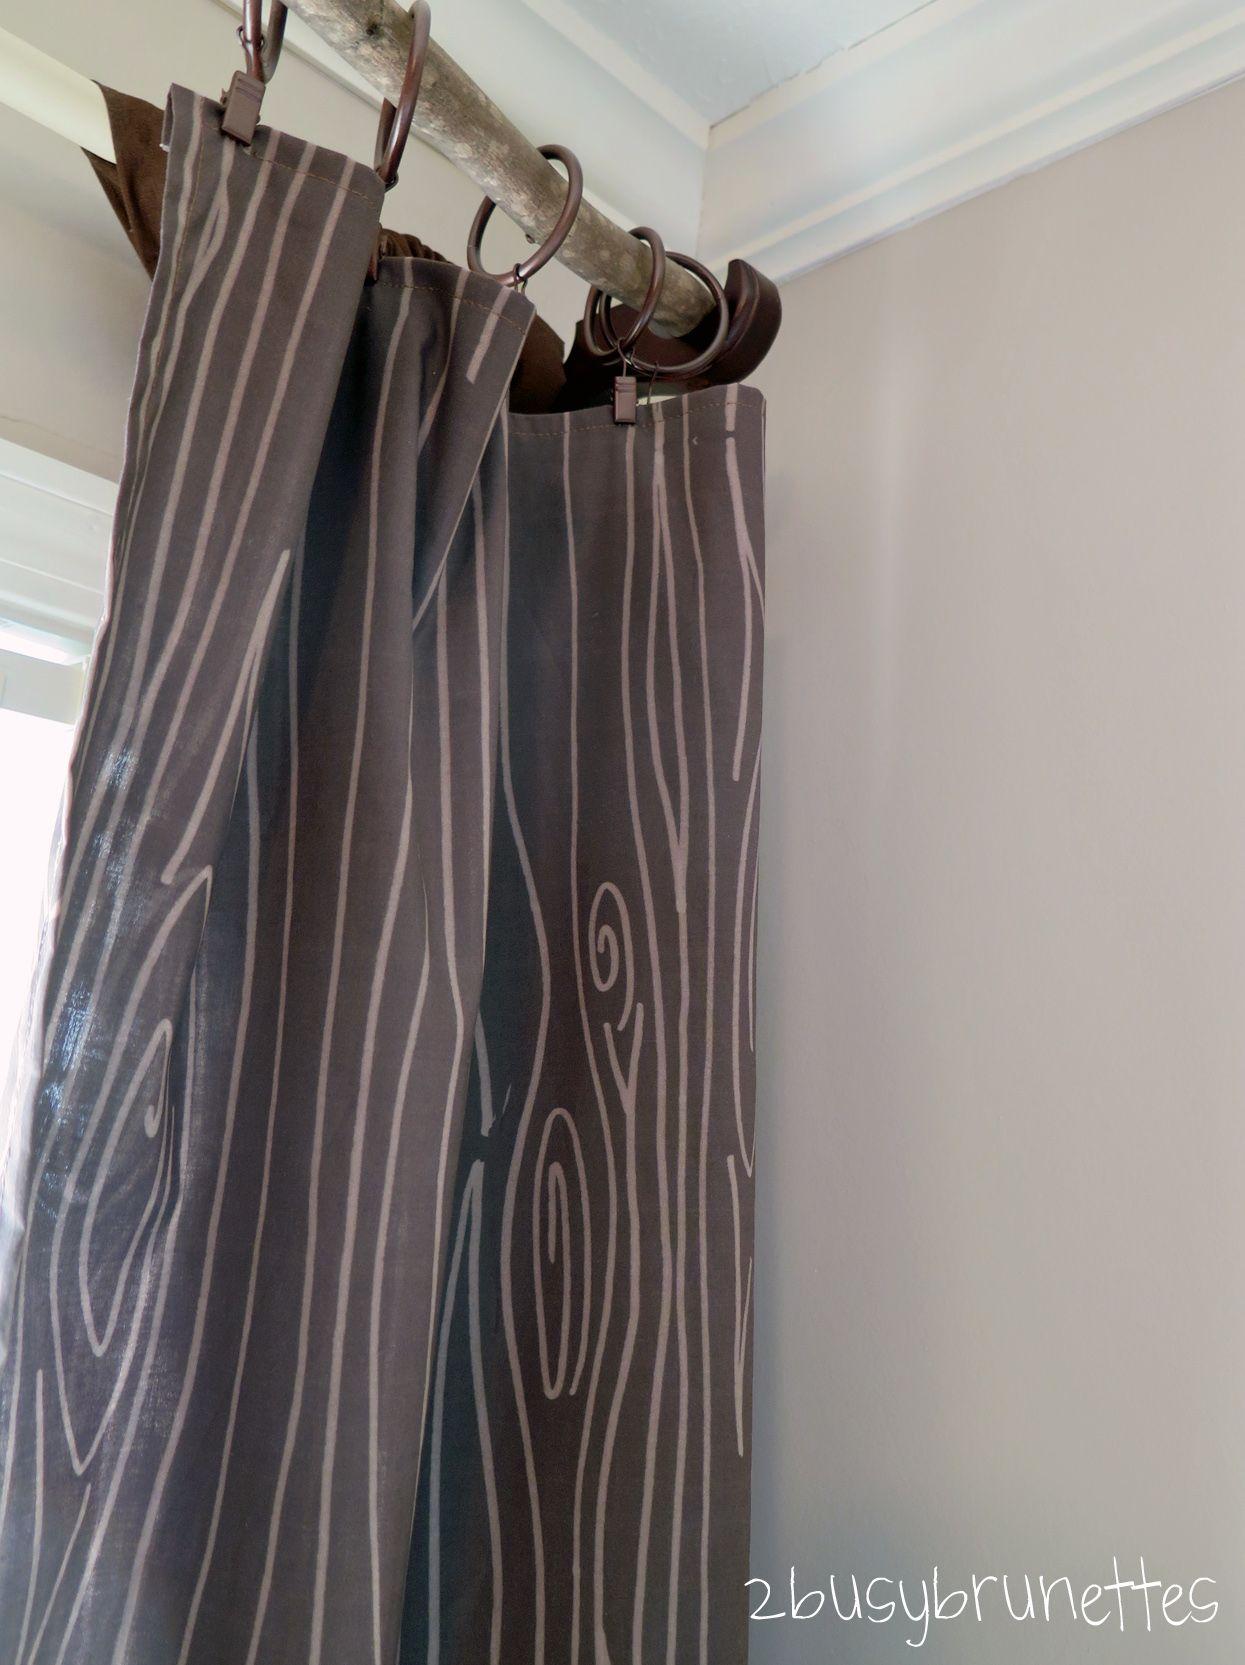 Adventure Nursery Curtains/Drapes